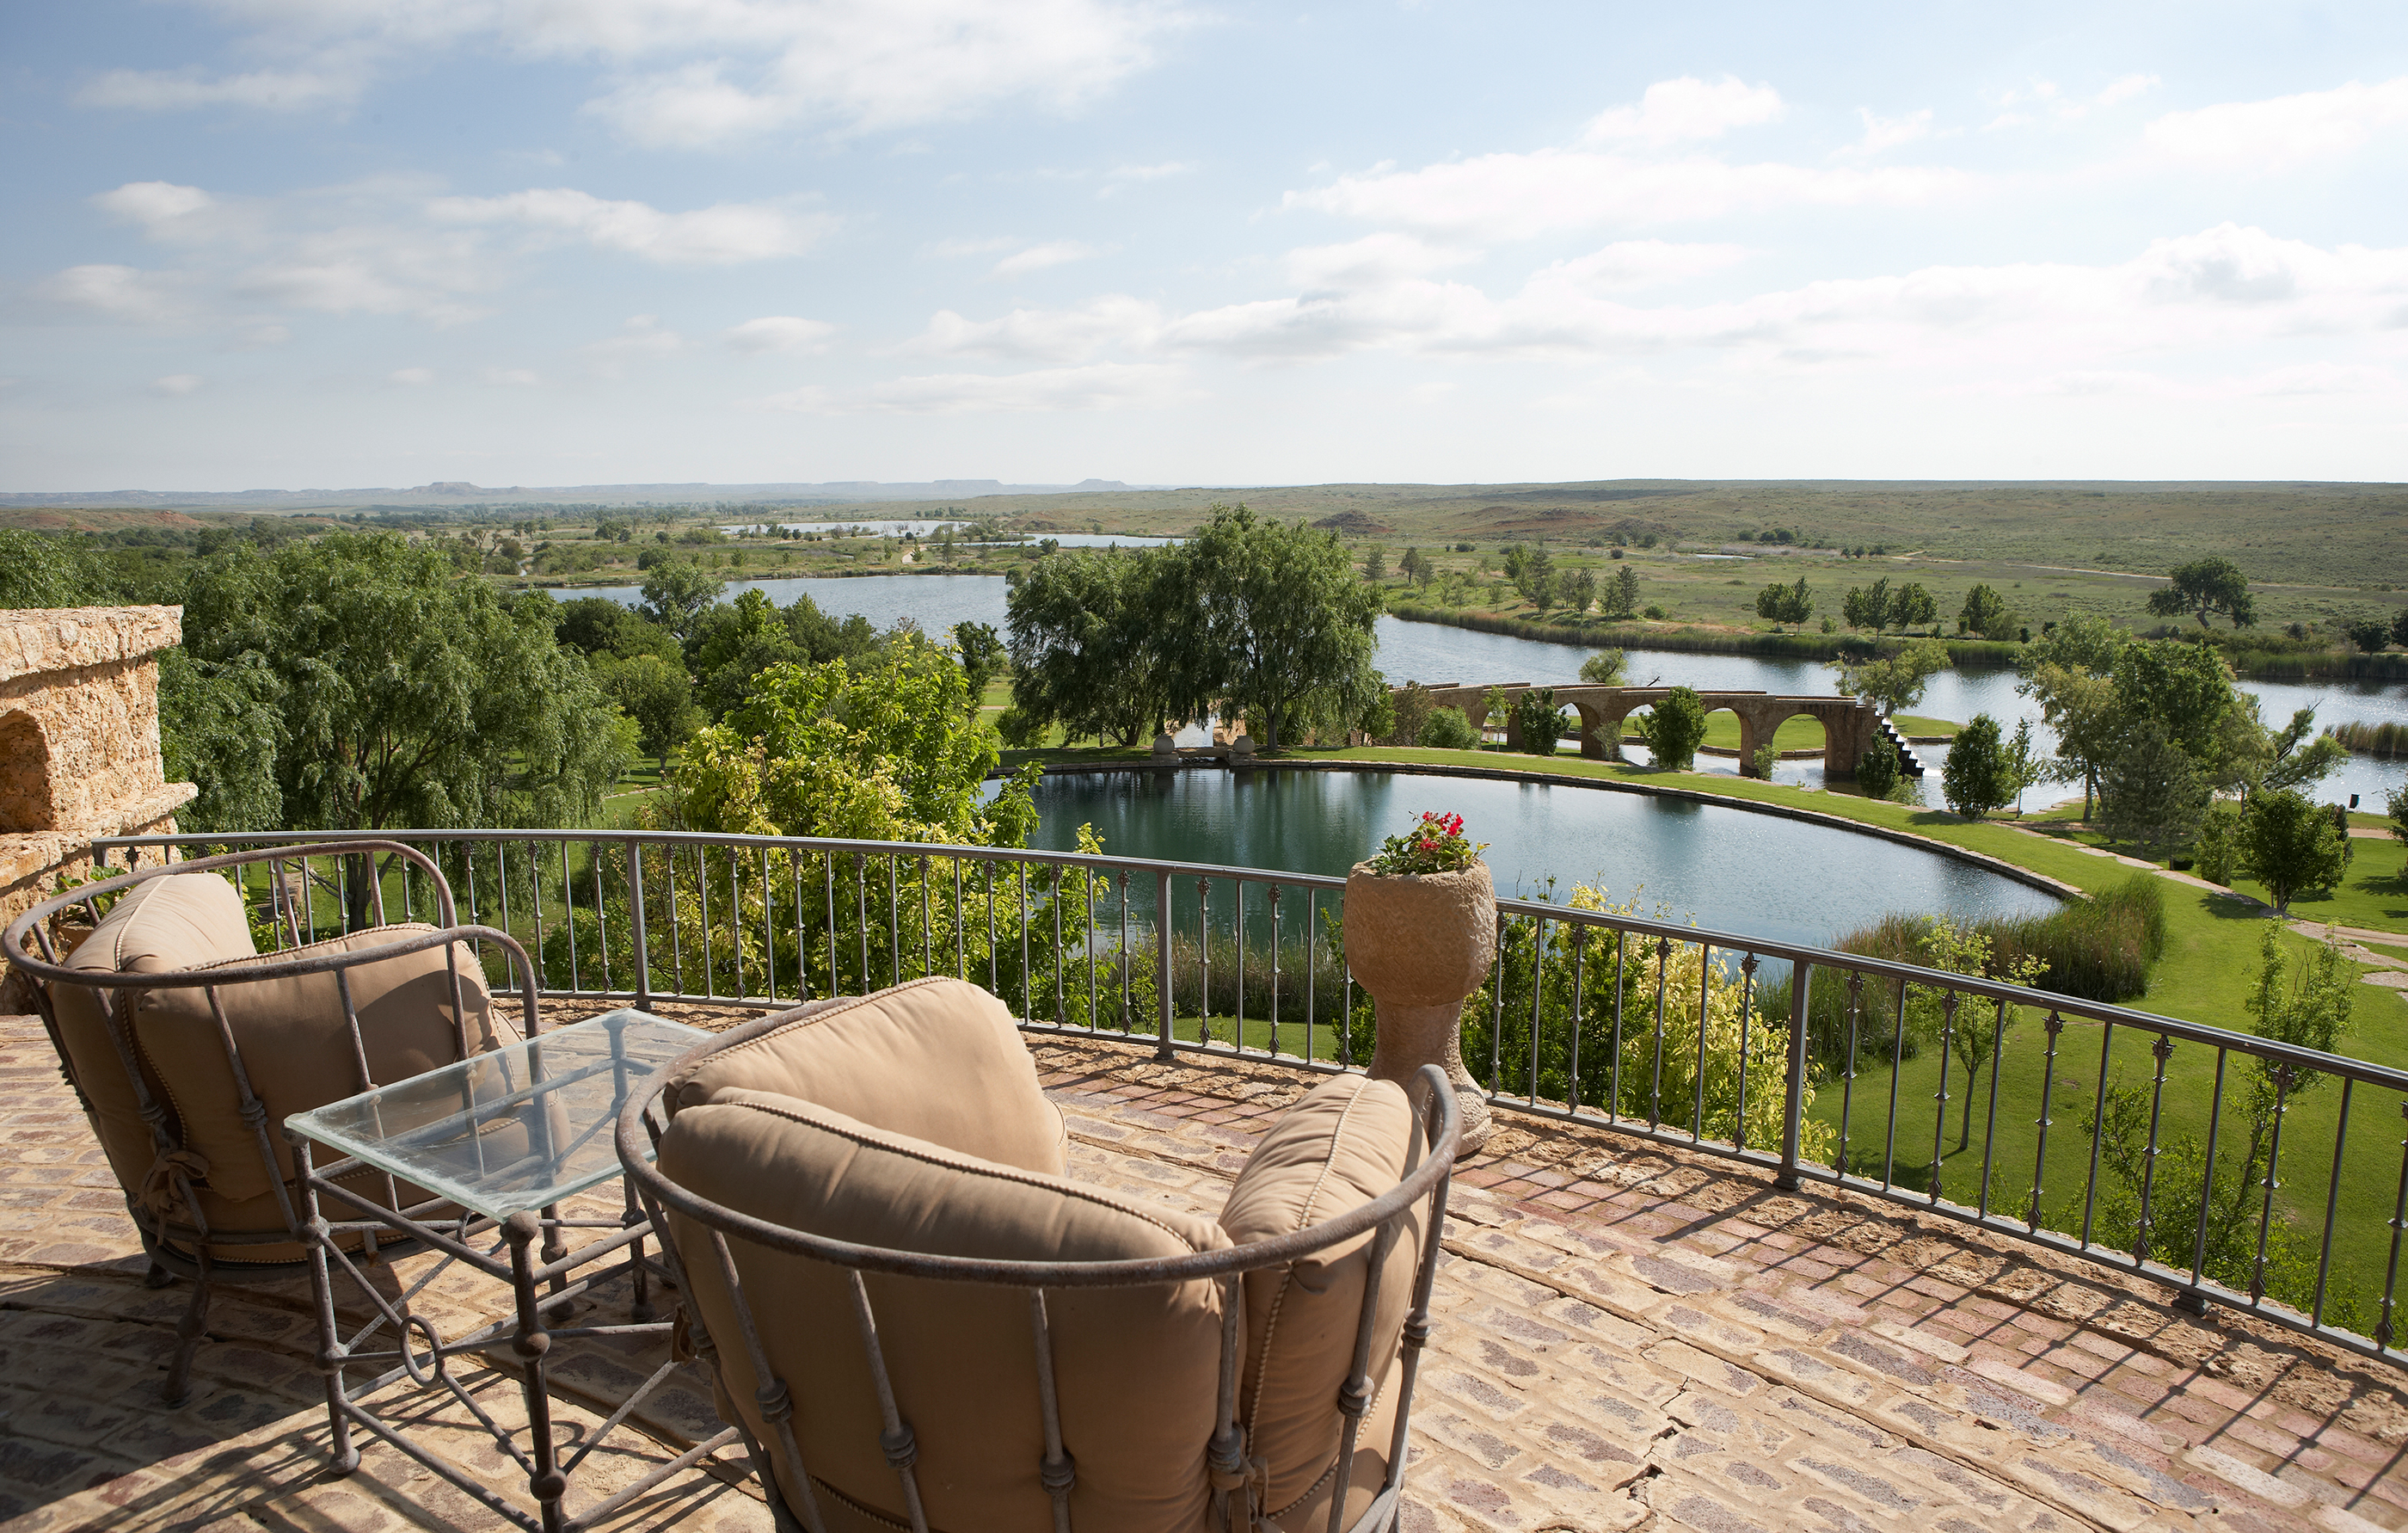 171204-t-boone-pickens-mesa-vista-ranch-10